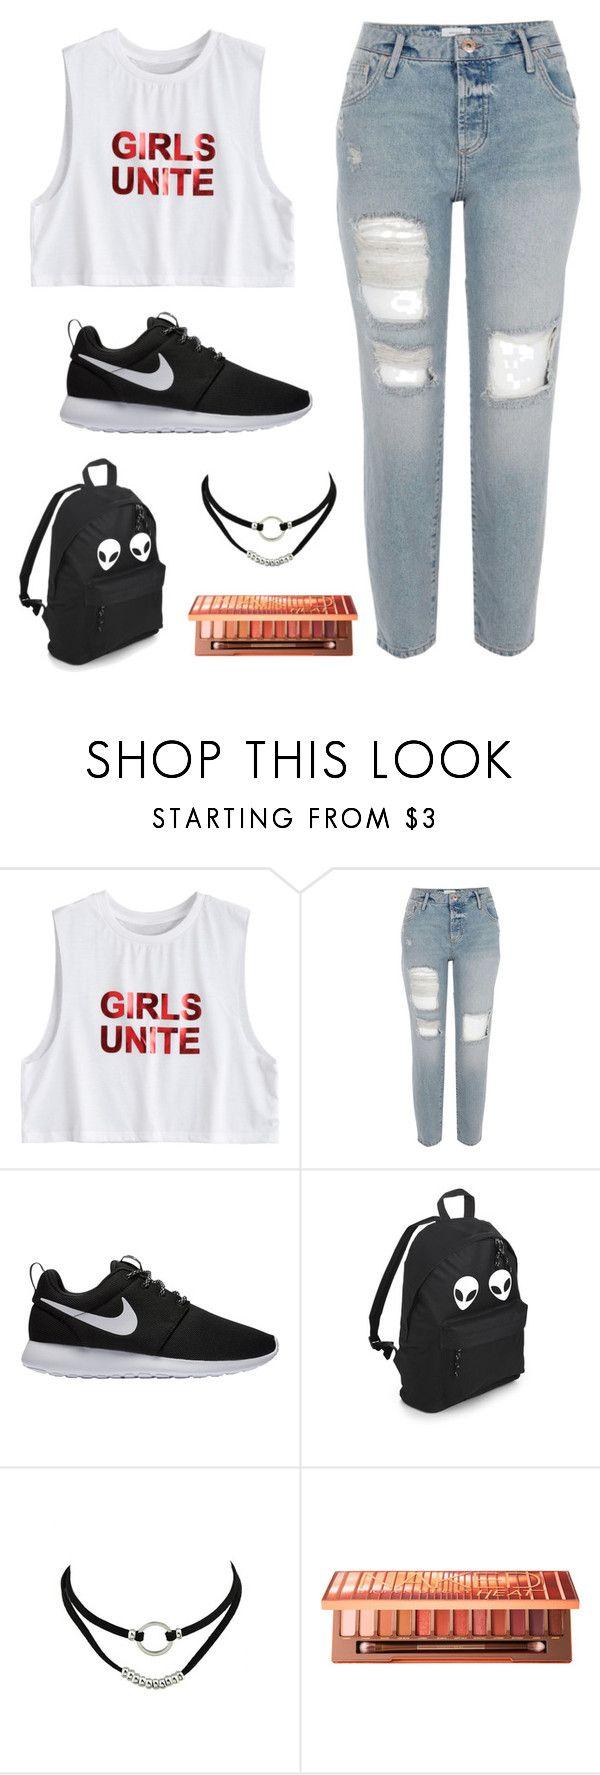 e596c8e7630 ... nike kobe 11 elite low oreo urban dictionary ... Best 25+ Nike outfits  tumblr ideas only on Pinterest Nike jacket tumblr ...